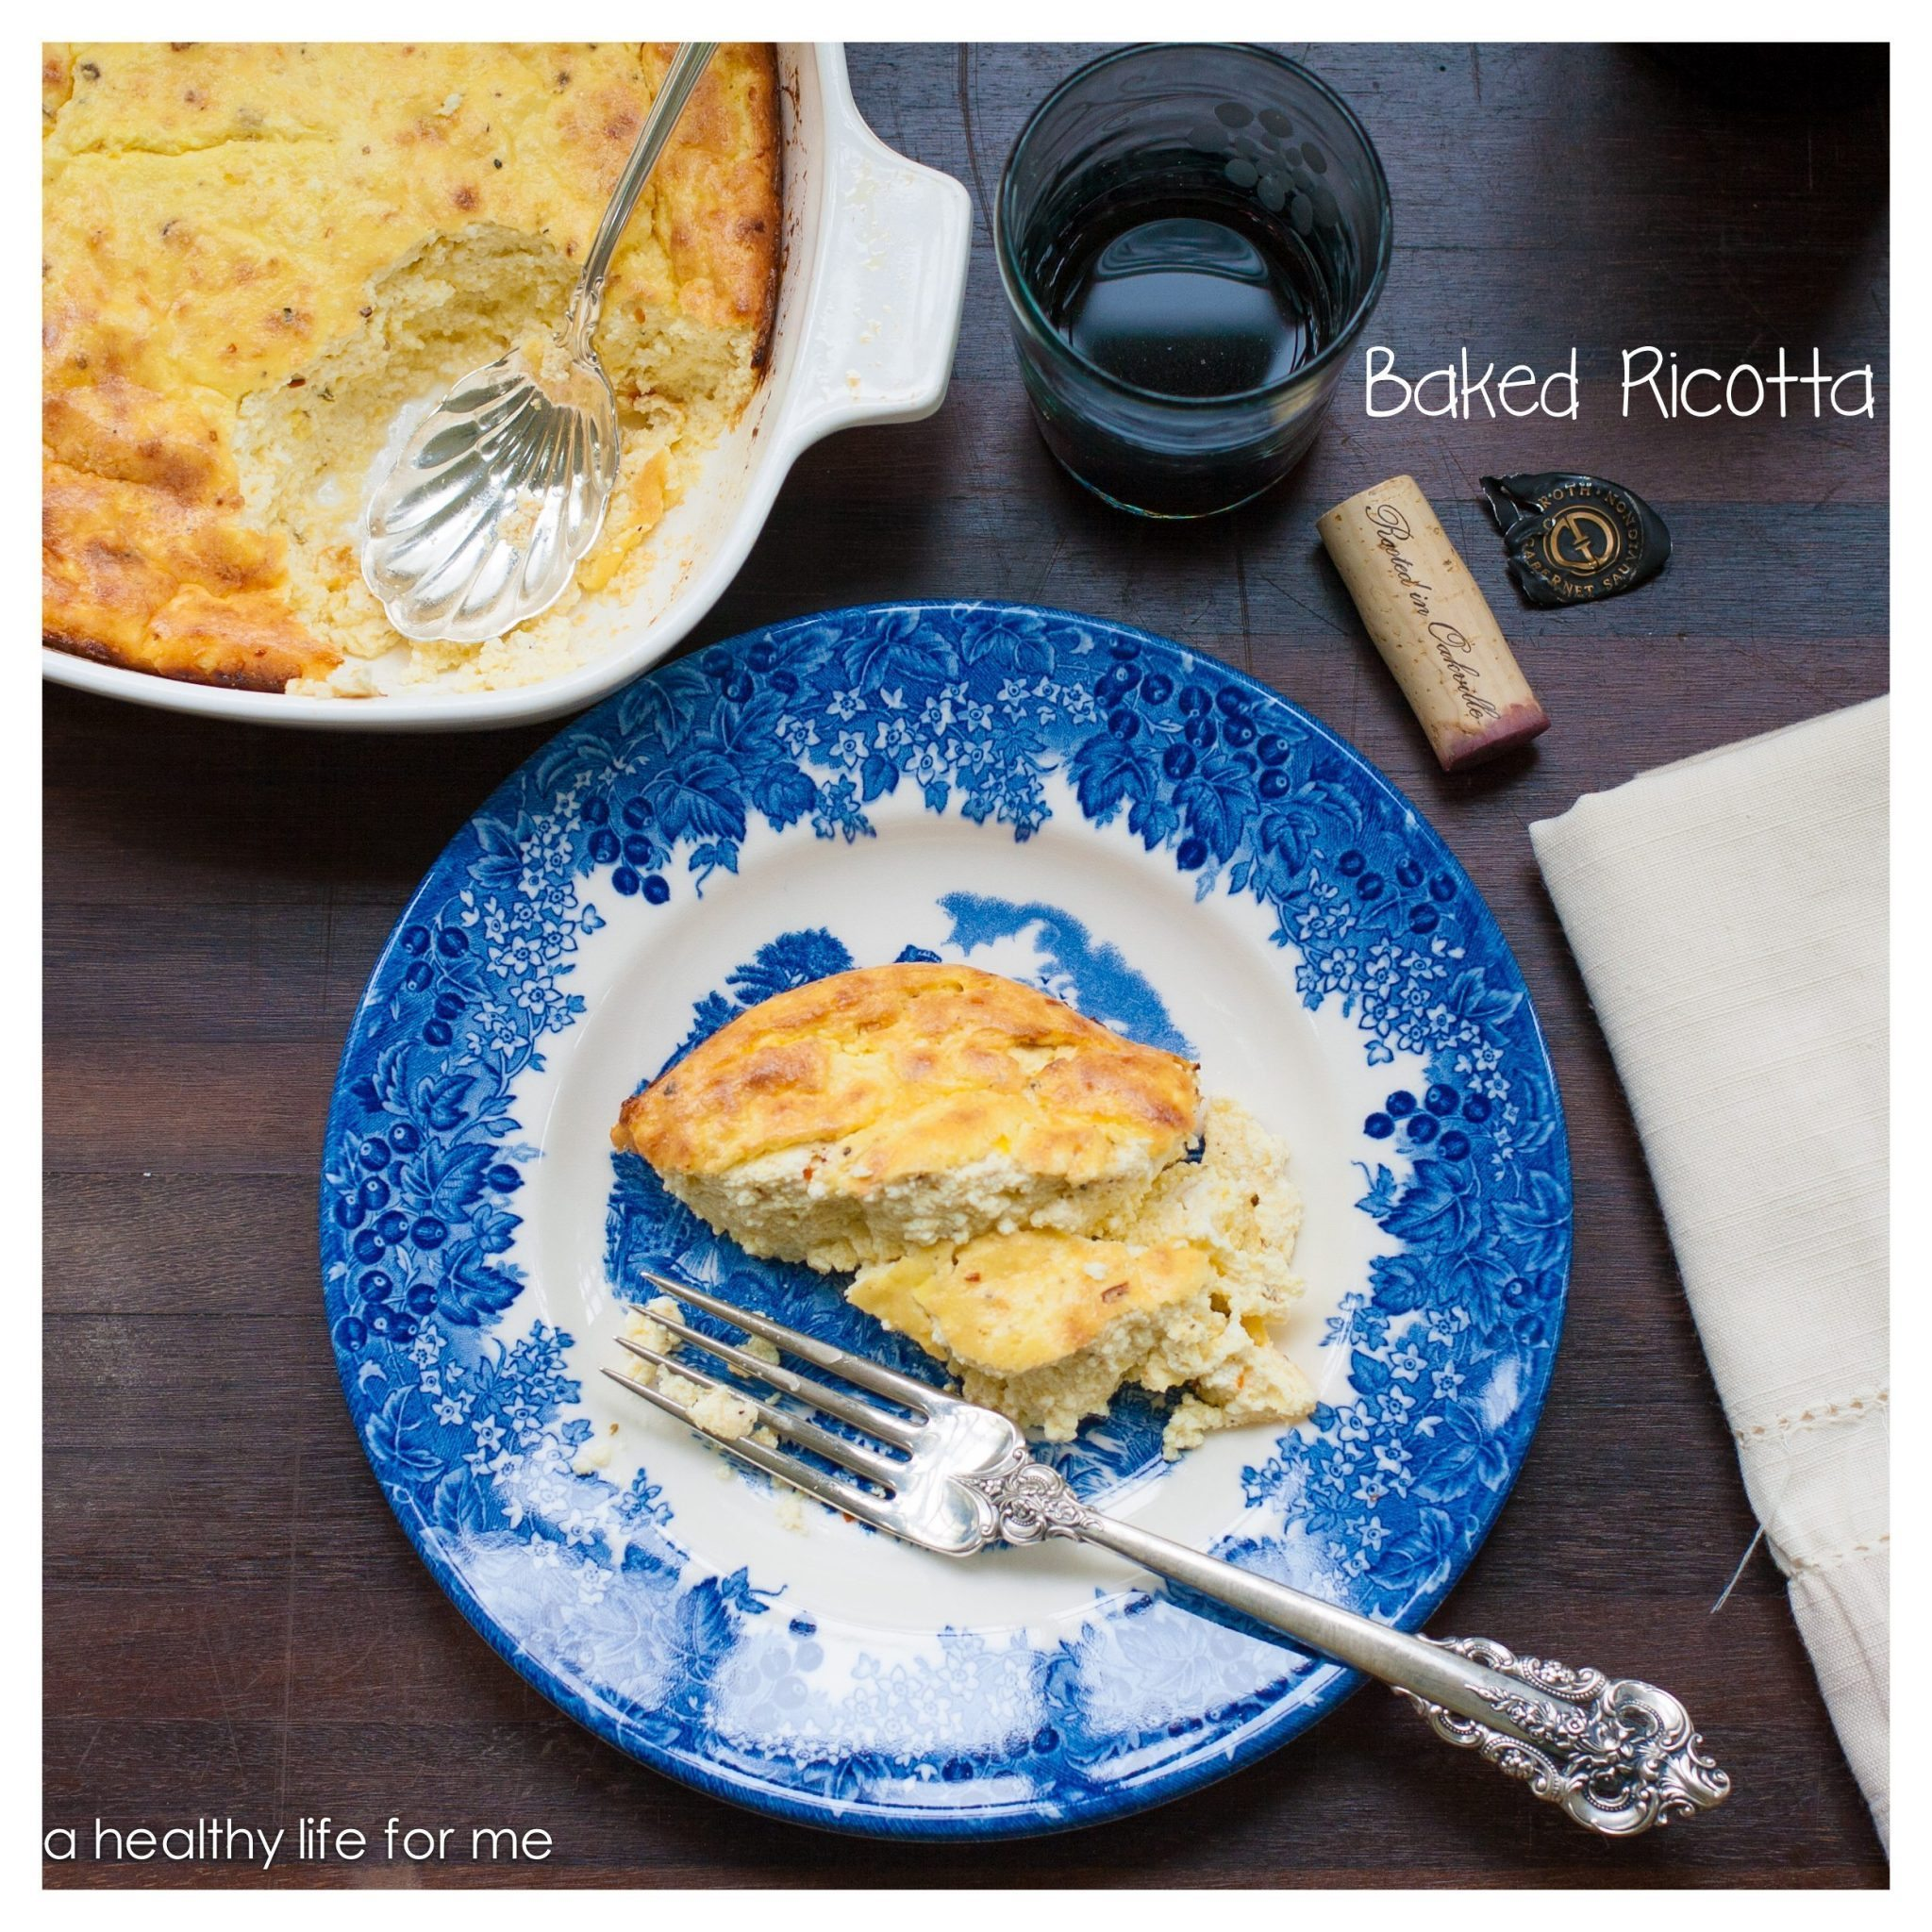 Baked Ricotta Gluten Free Vegetarian